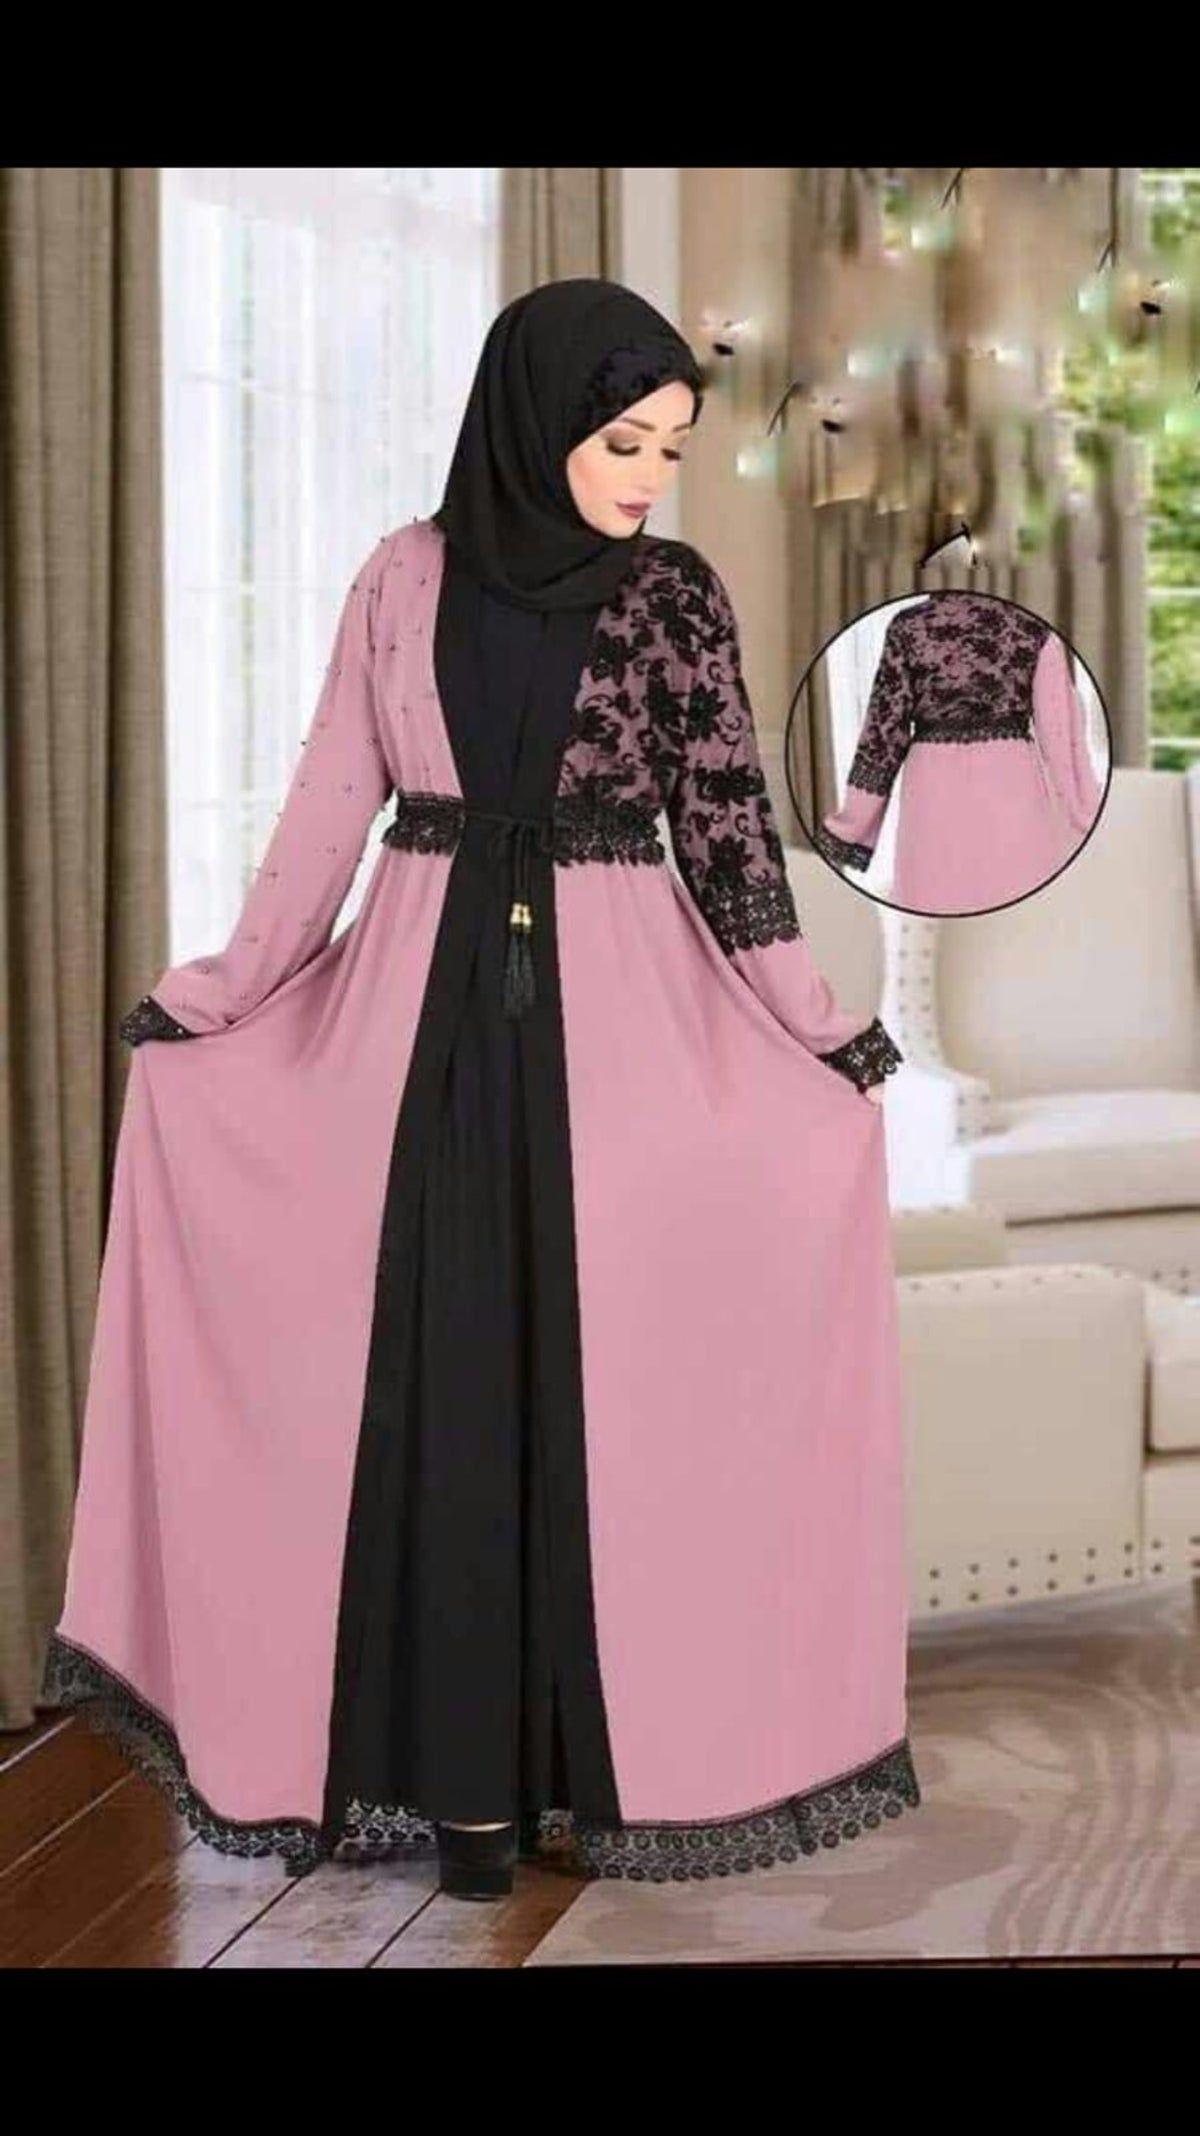 Pin By Ey Llam On Products Abaya Fashion Abayas Fashion Abaya Designs